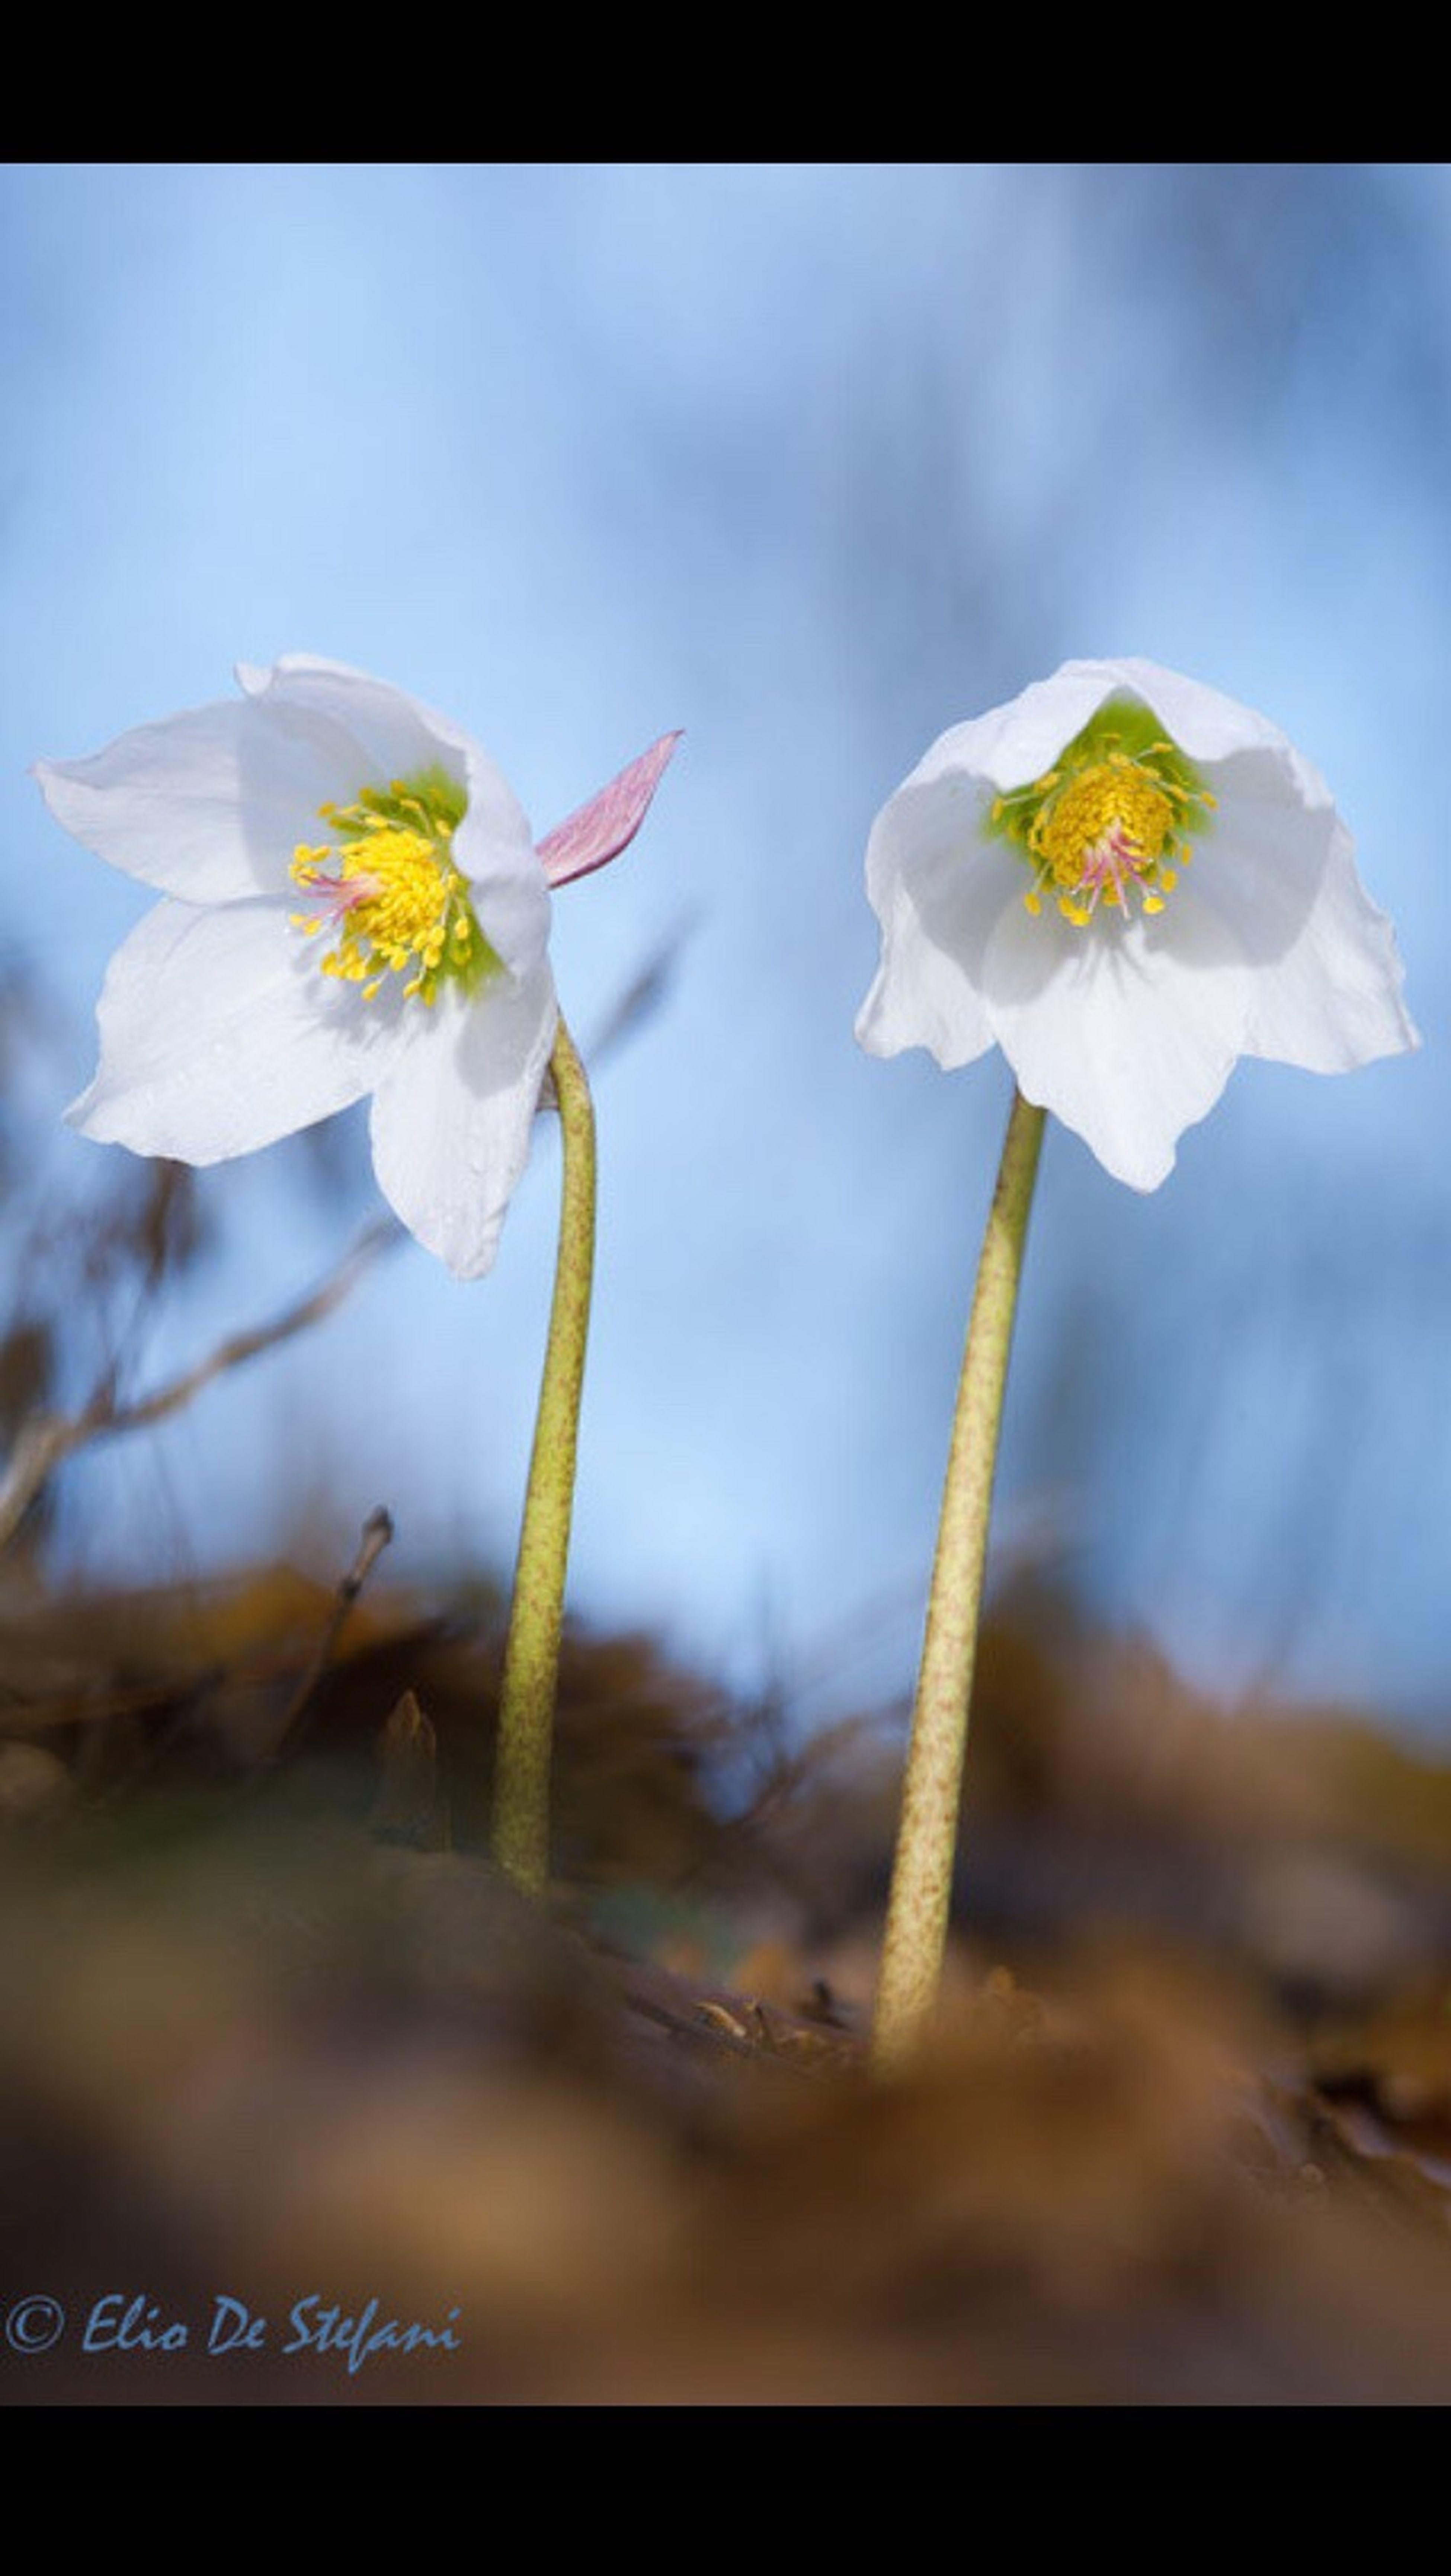 Helleborus Niger Helleborus Niger Rosa Di Natale Fiori Invernali Wildflowers Fiorispontanei